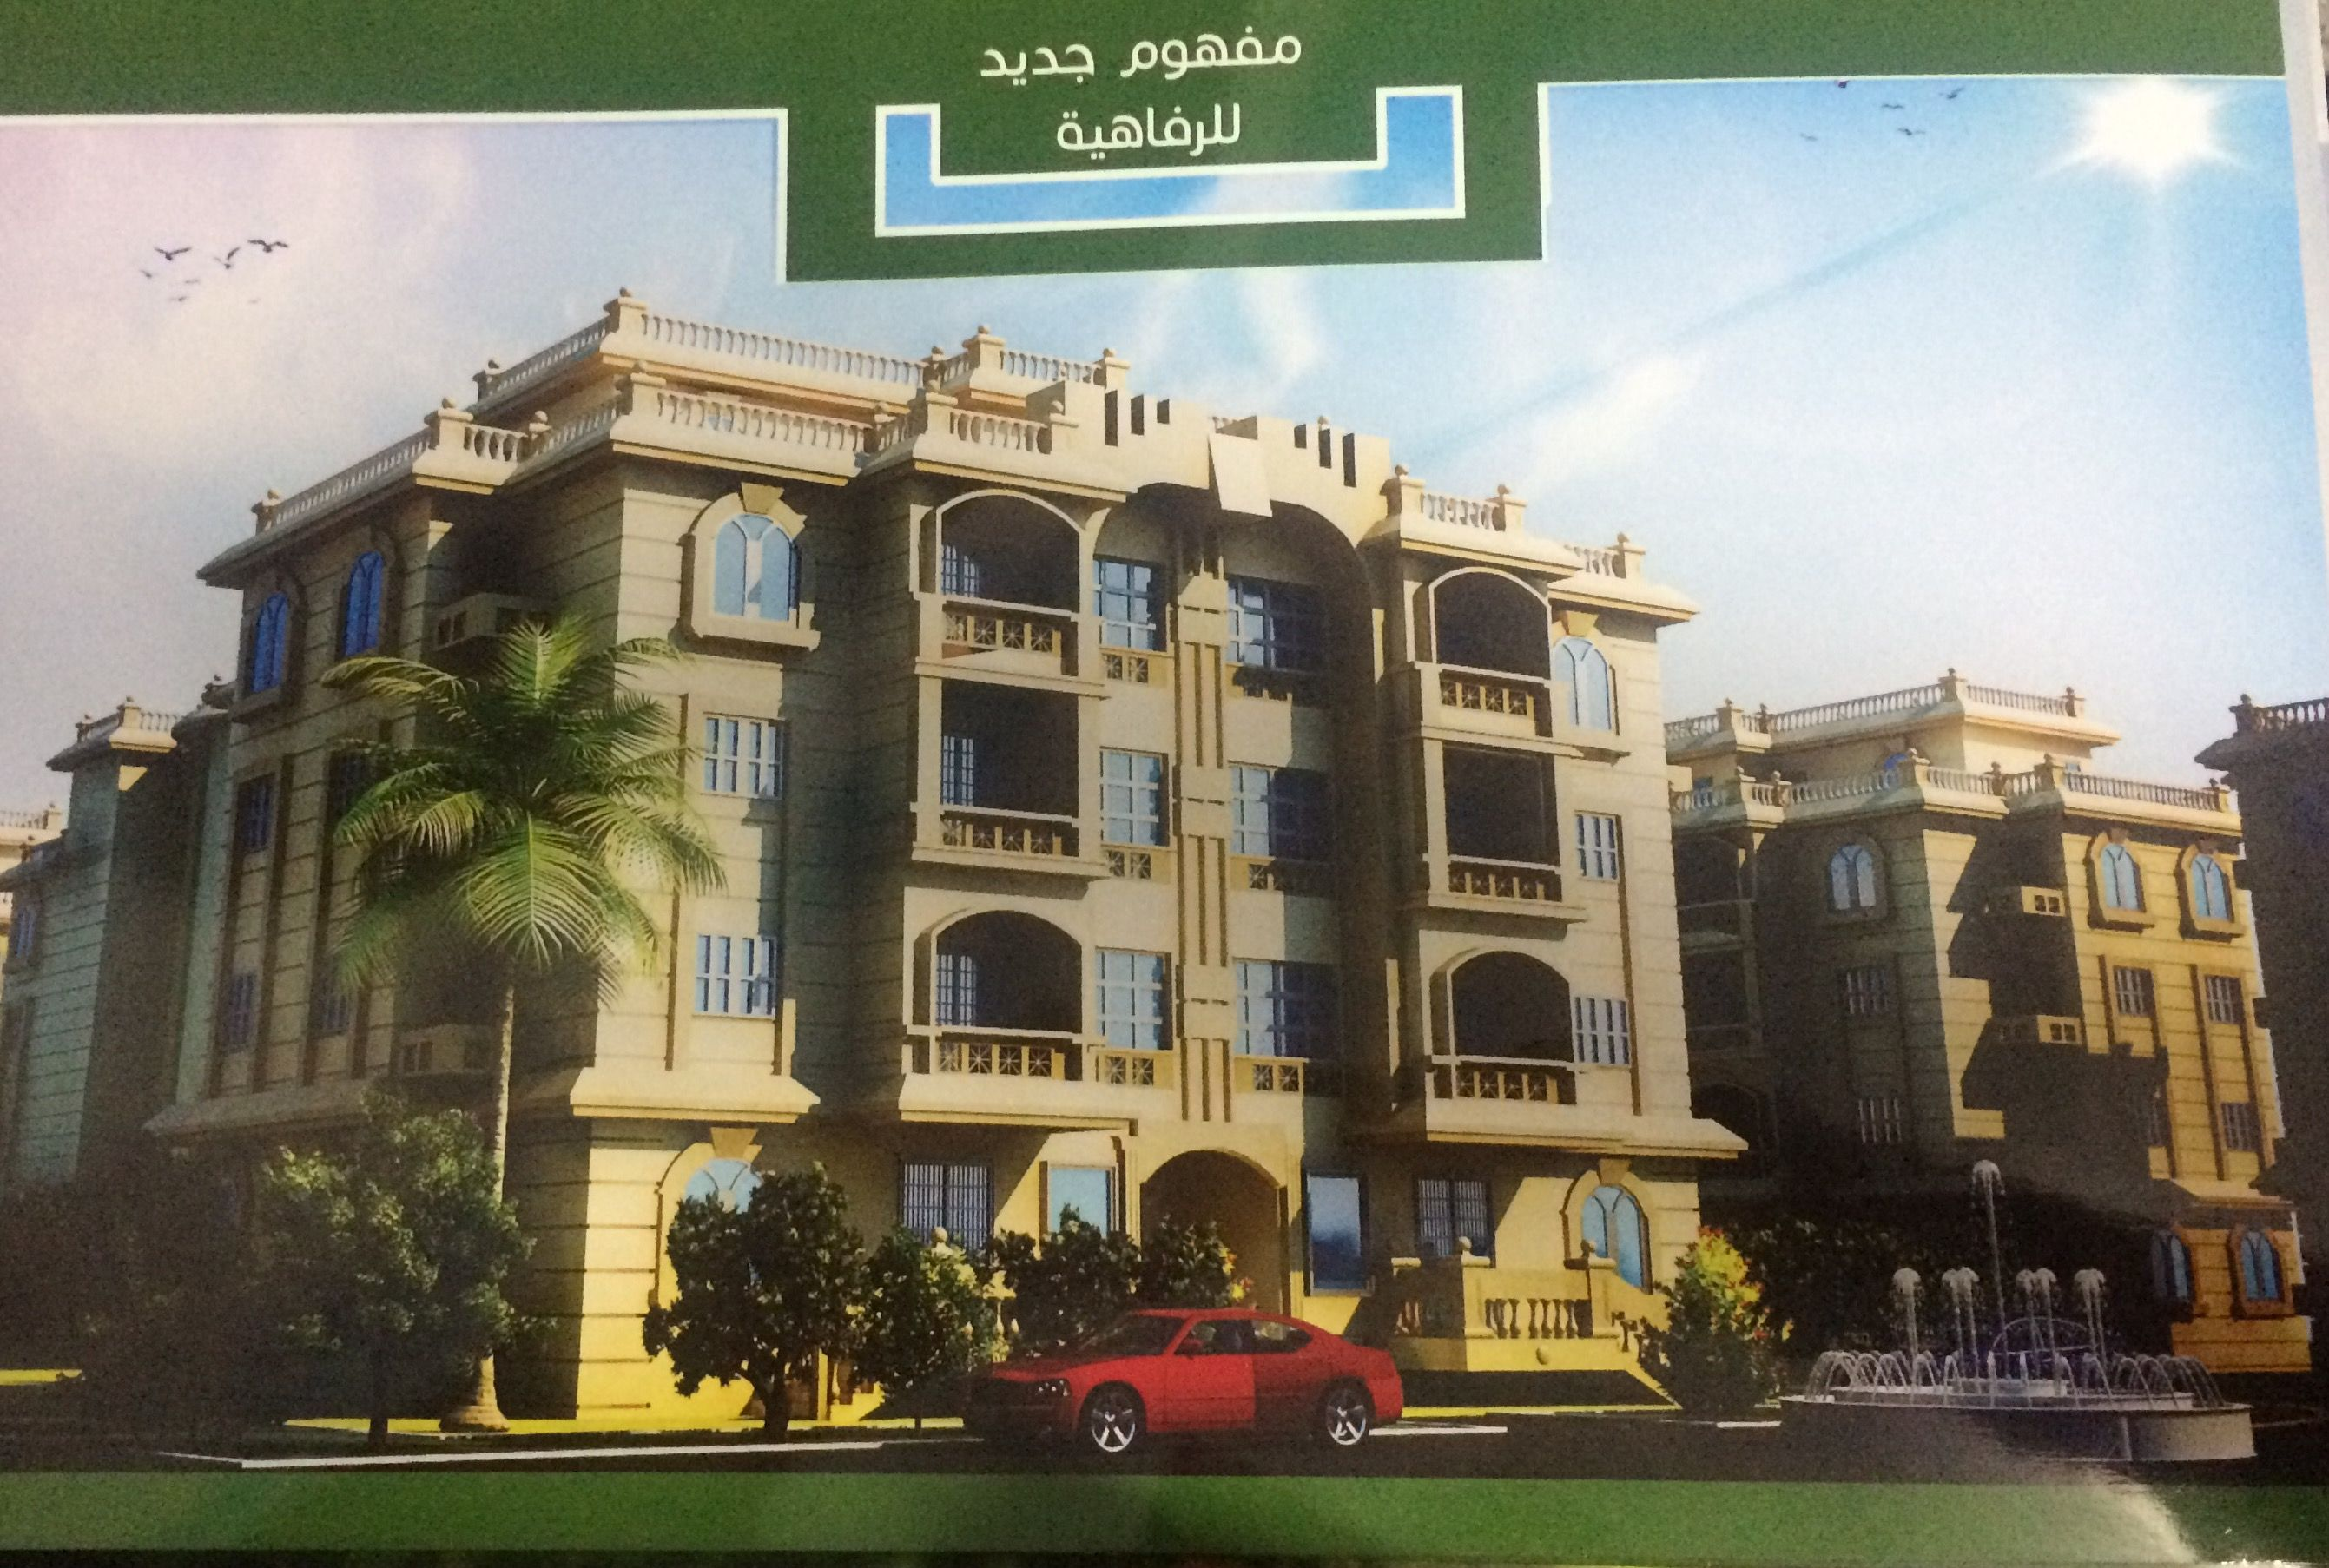 شقق للبيع في 6 اكتوبر شقق للبيع في ٦ اكتوبر بمقدم ٦٣٠٠٠ جنيه Apartments For Sale Landmarks Real Estate